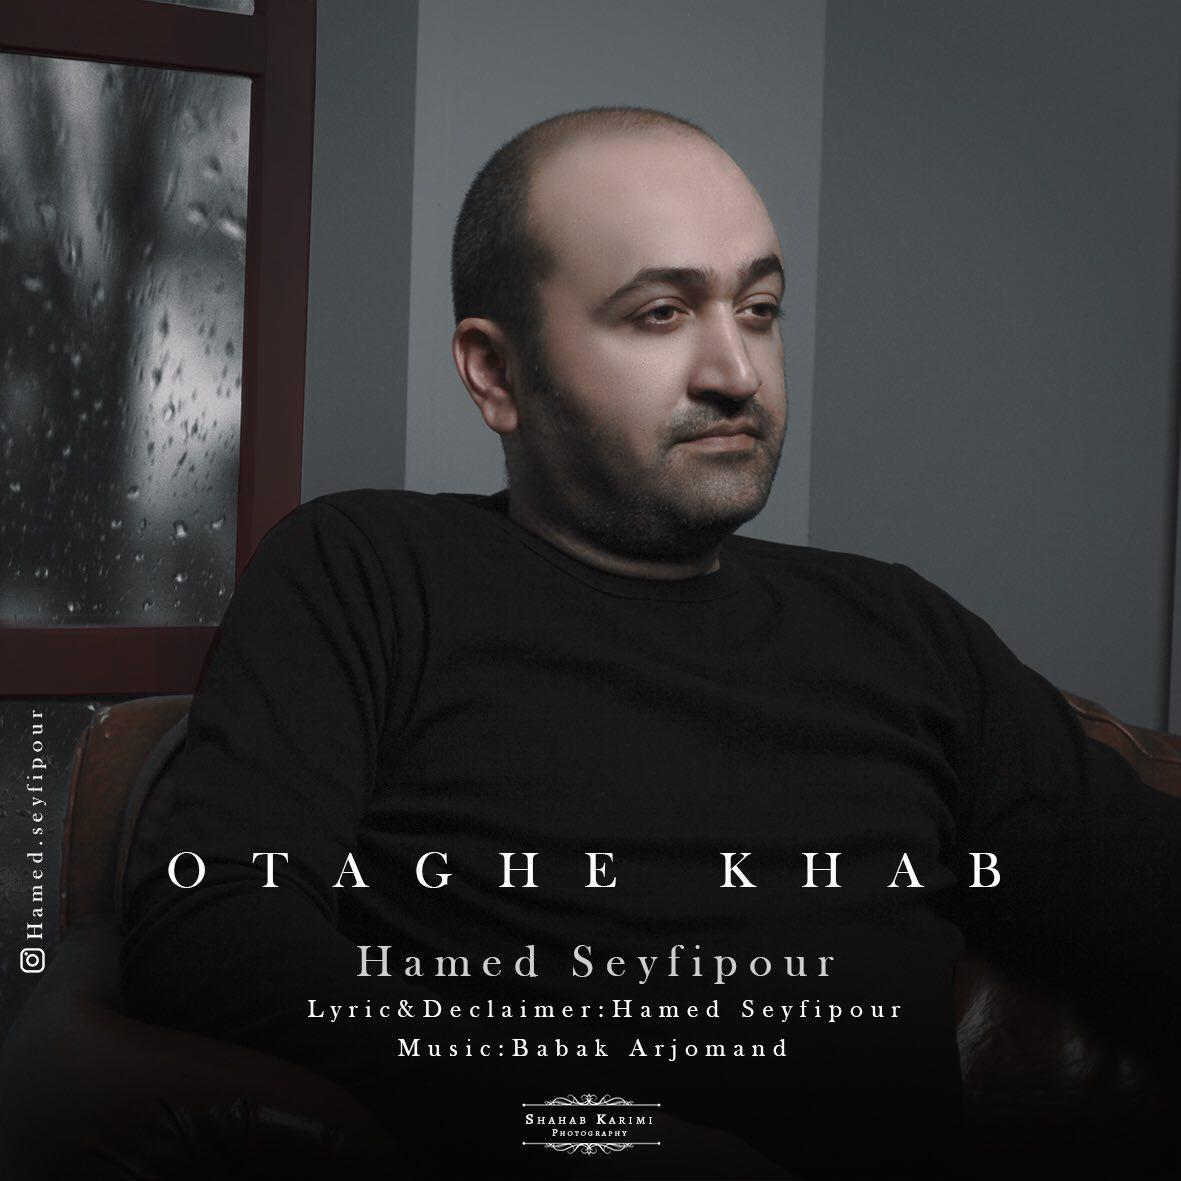 Hamed Seyfipour – Otaghe Khab